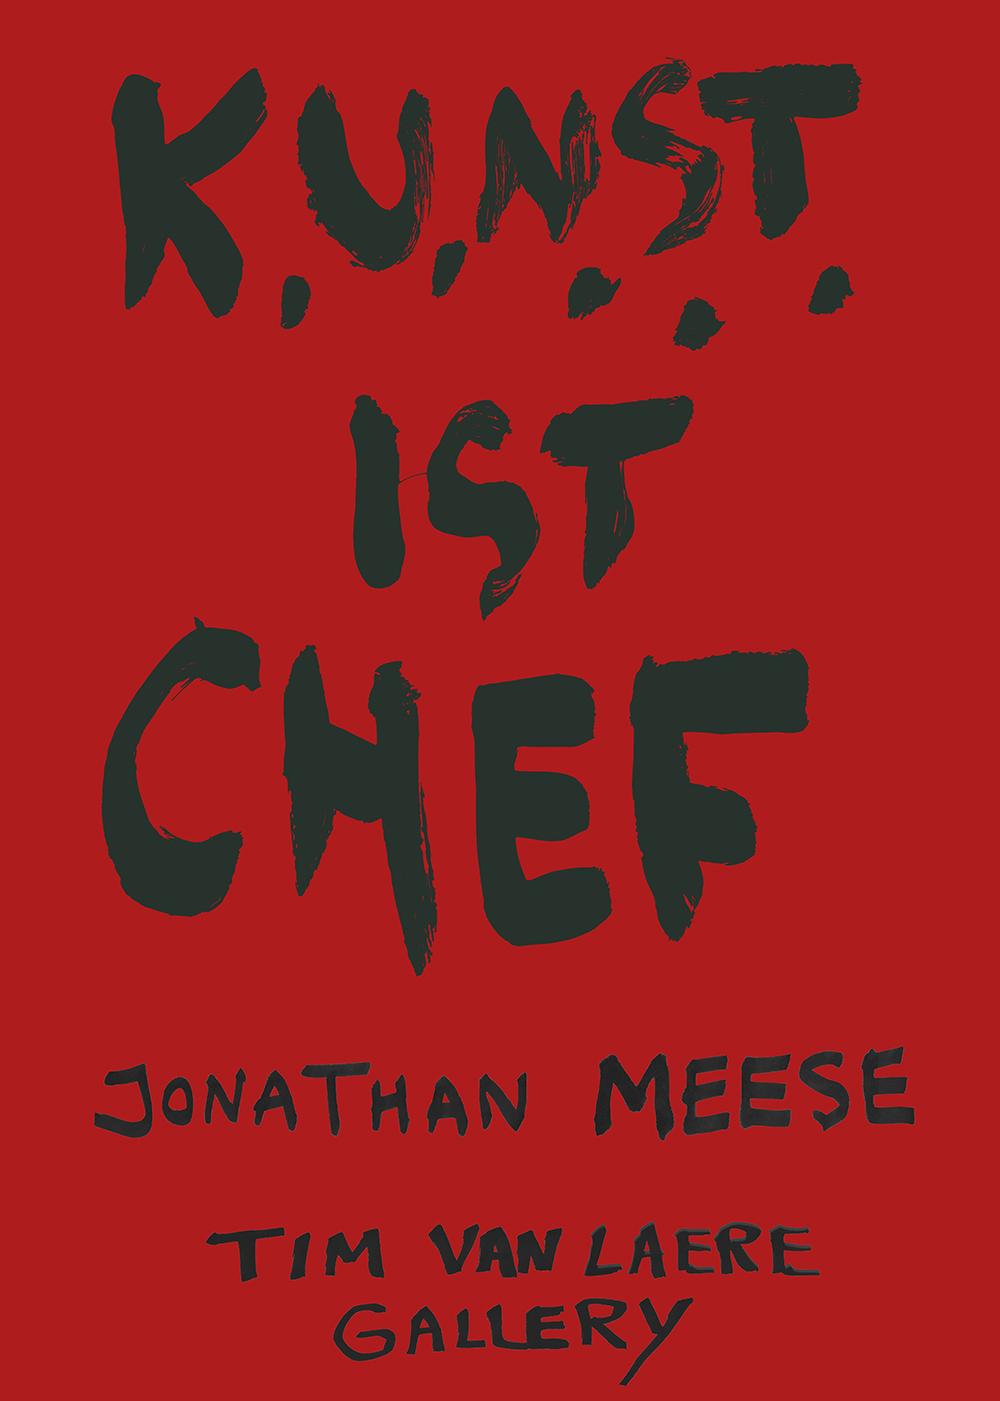 Jonathan_Meese_Jonathan-Meese-KUNSTISTCHEF-TIMVANLAEREGALLERY